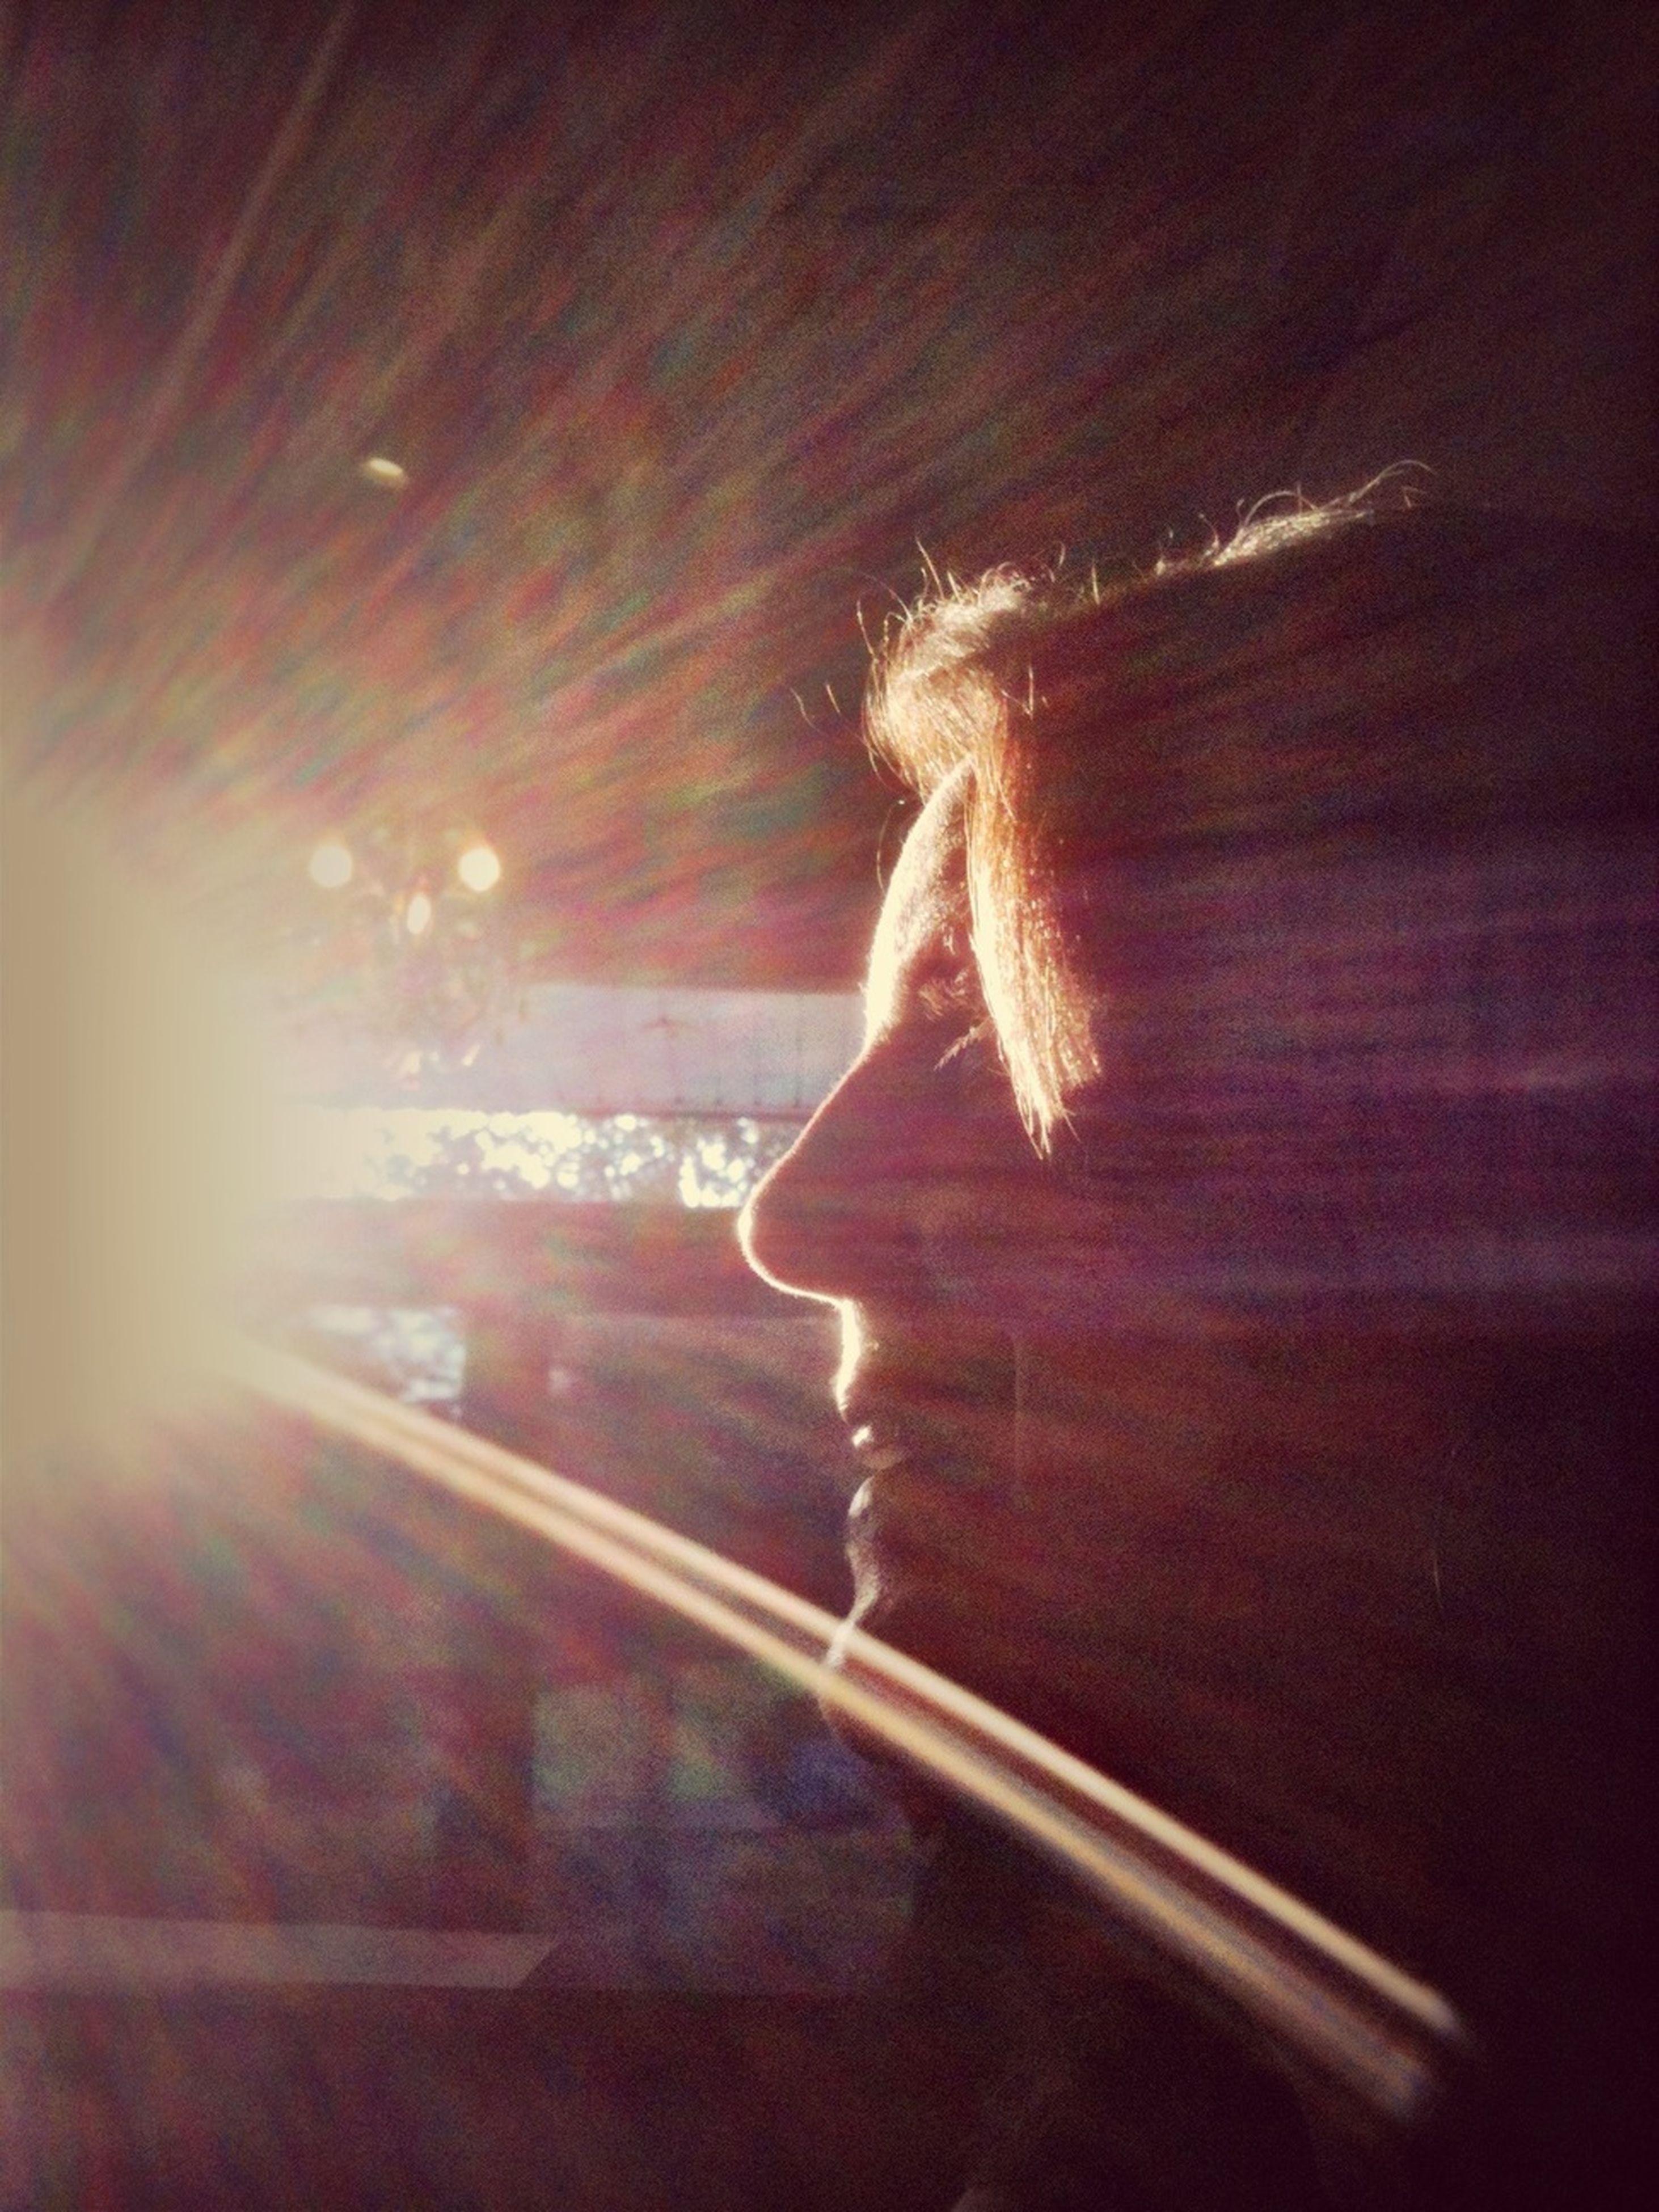 night, illuminated, transportation, road, street, lens flare, full length, lifestyles, motion, car, rear view, blurred motion, the way forward, sunbeam, glowing, leisure activity, sunlight, light - natural phenomenon